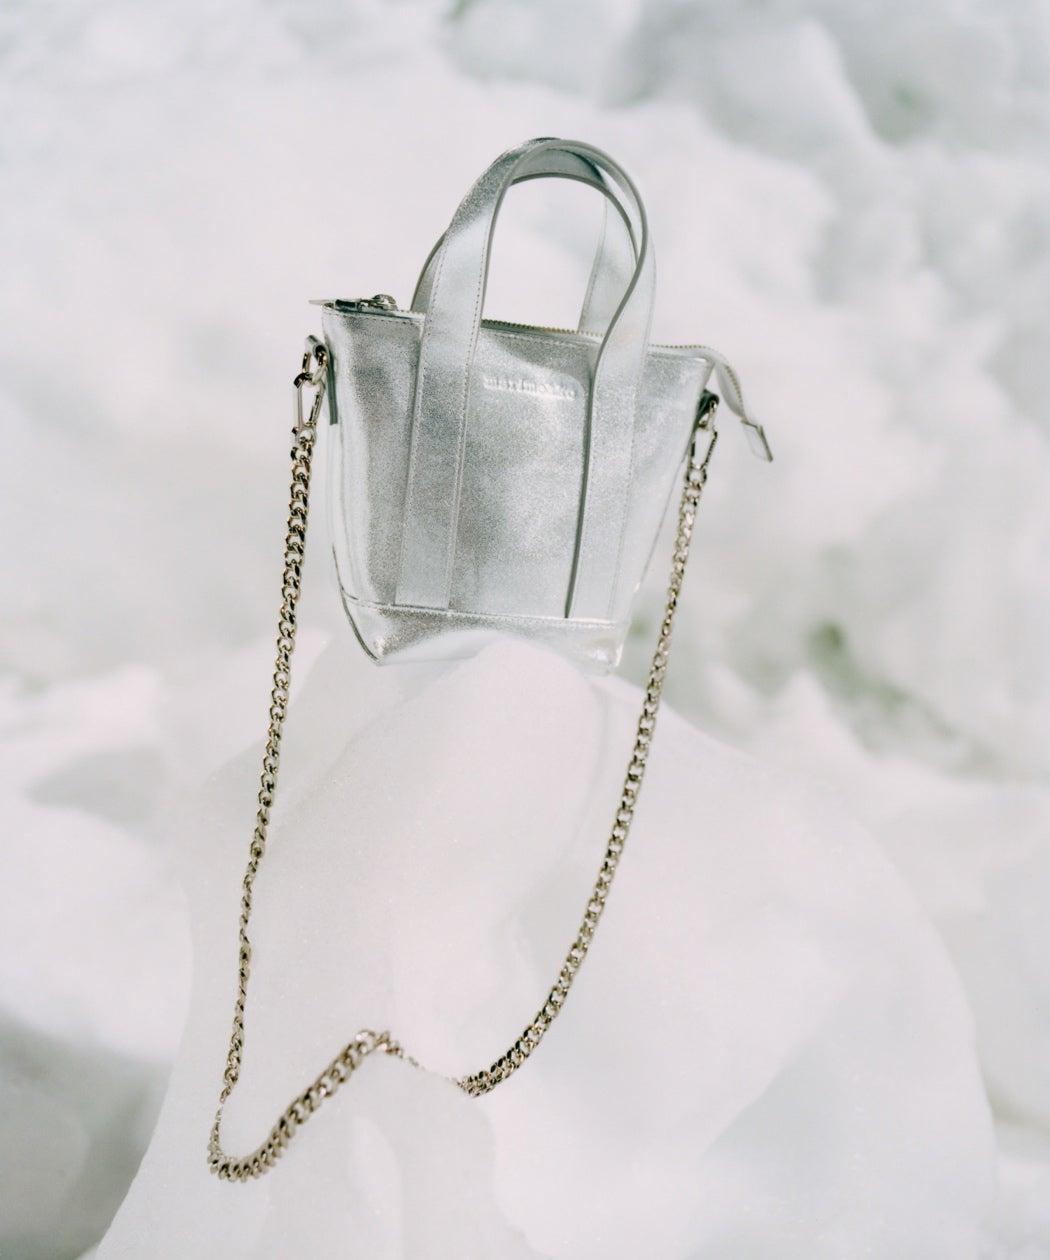 Marimekko bags